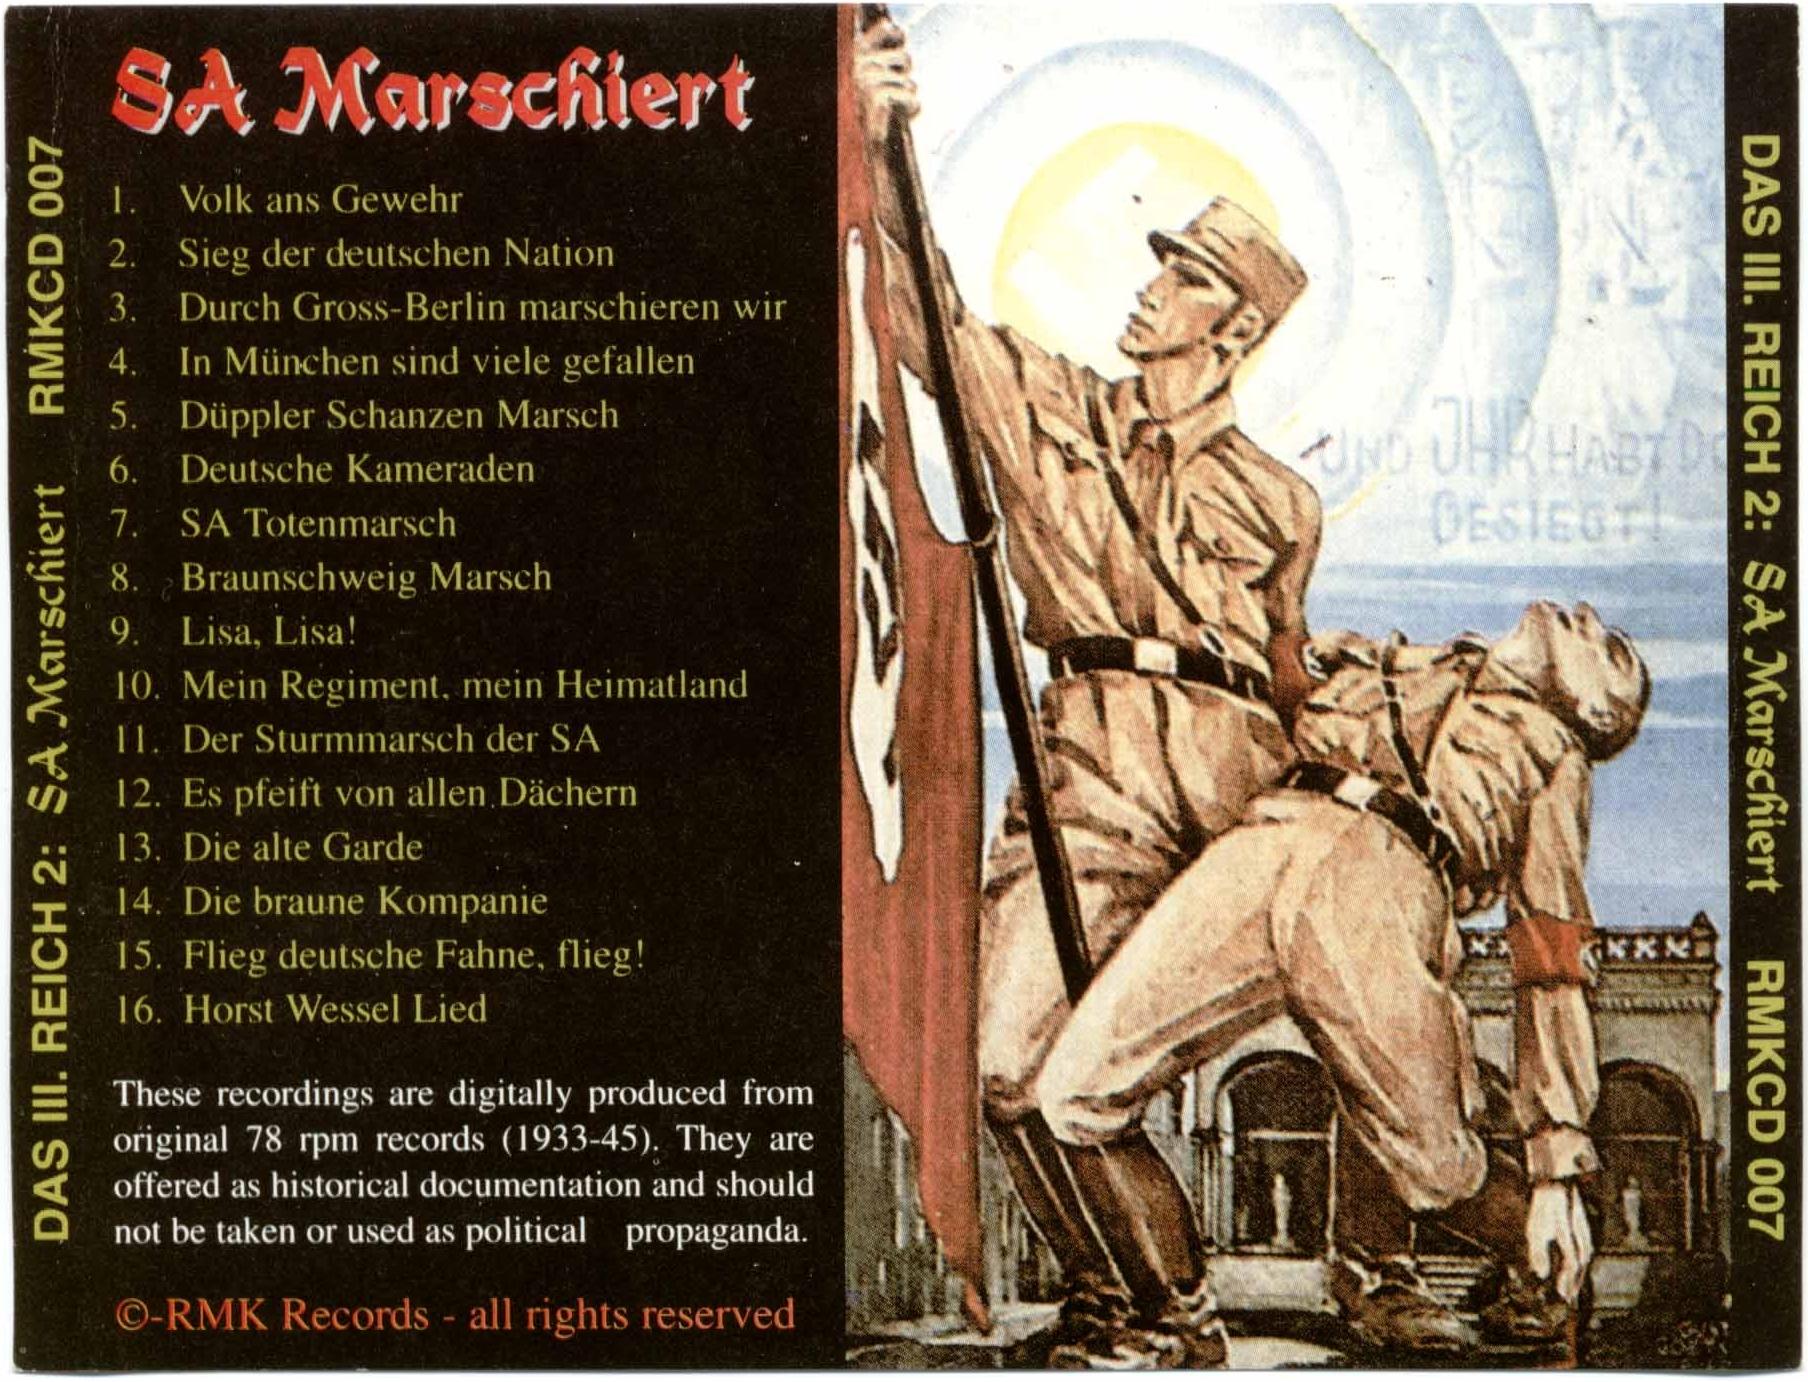 Reichsmusikkammer_-_Das_III._Reich_2_-_SA_marschiert_-_2.JPG